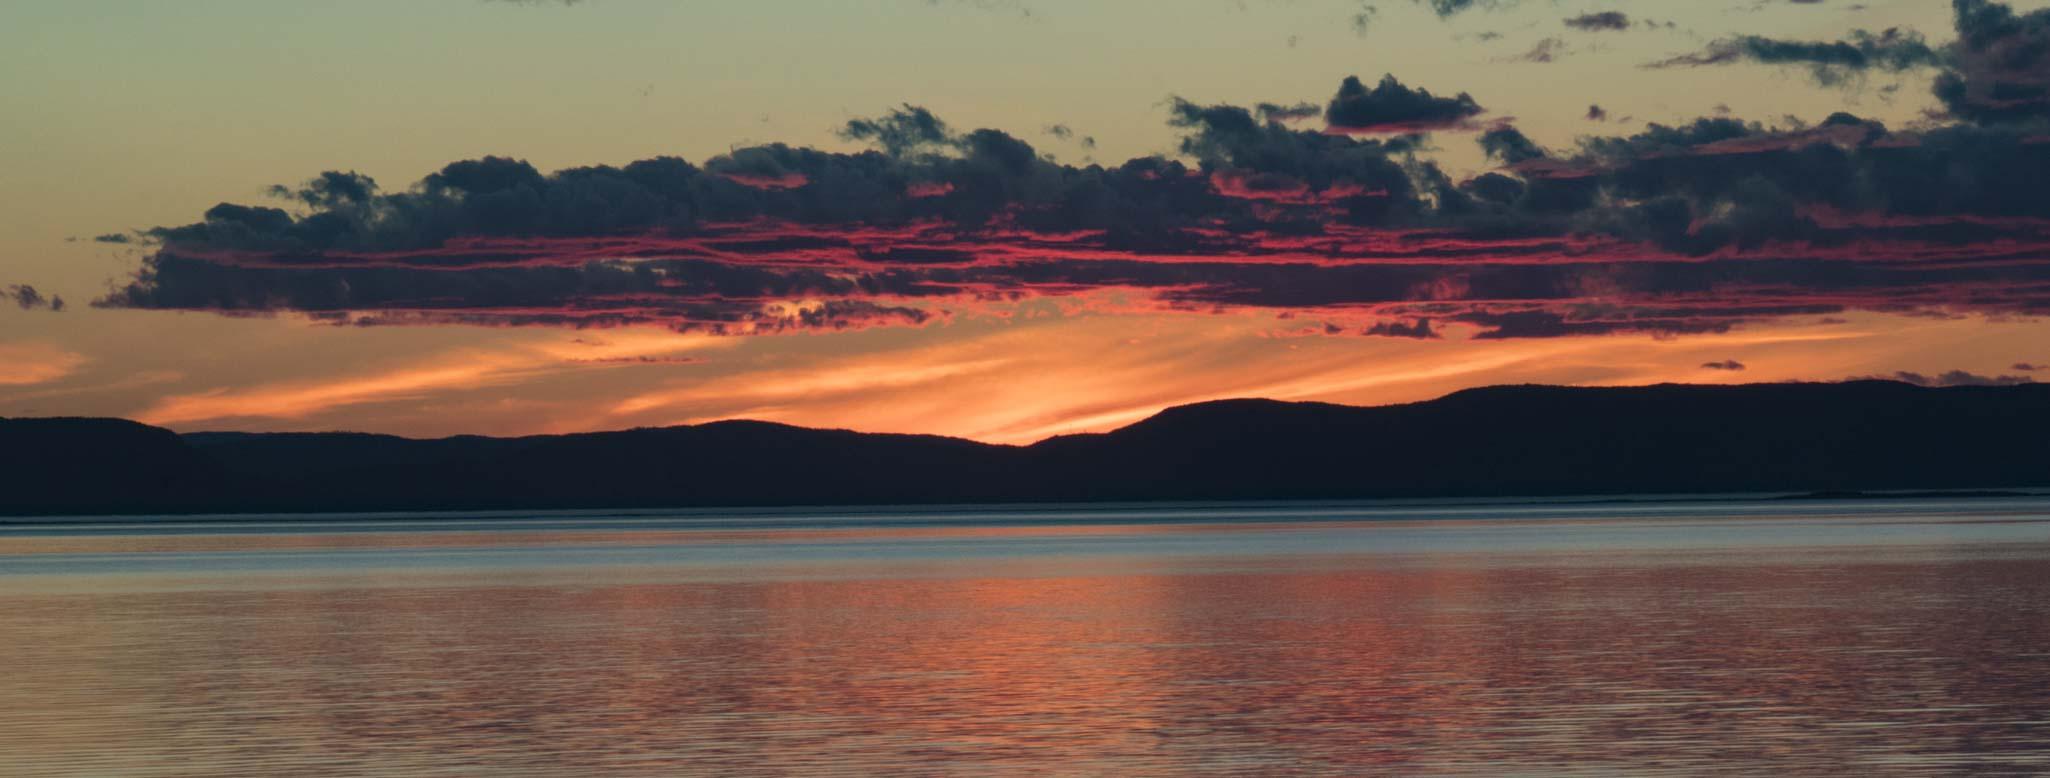 0723 Sunset (1 of 1)